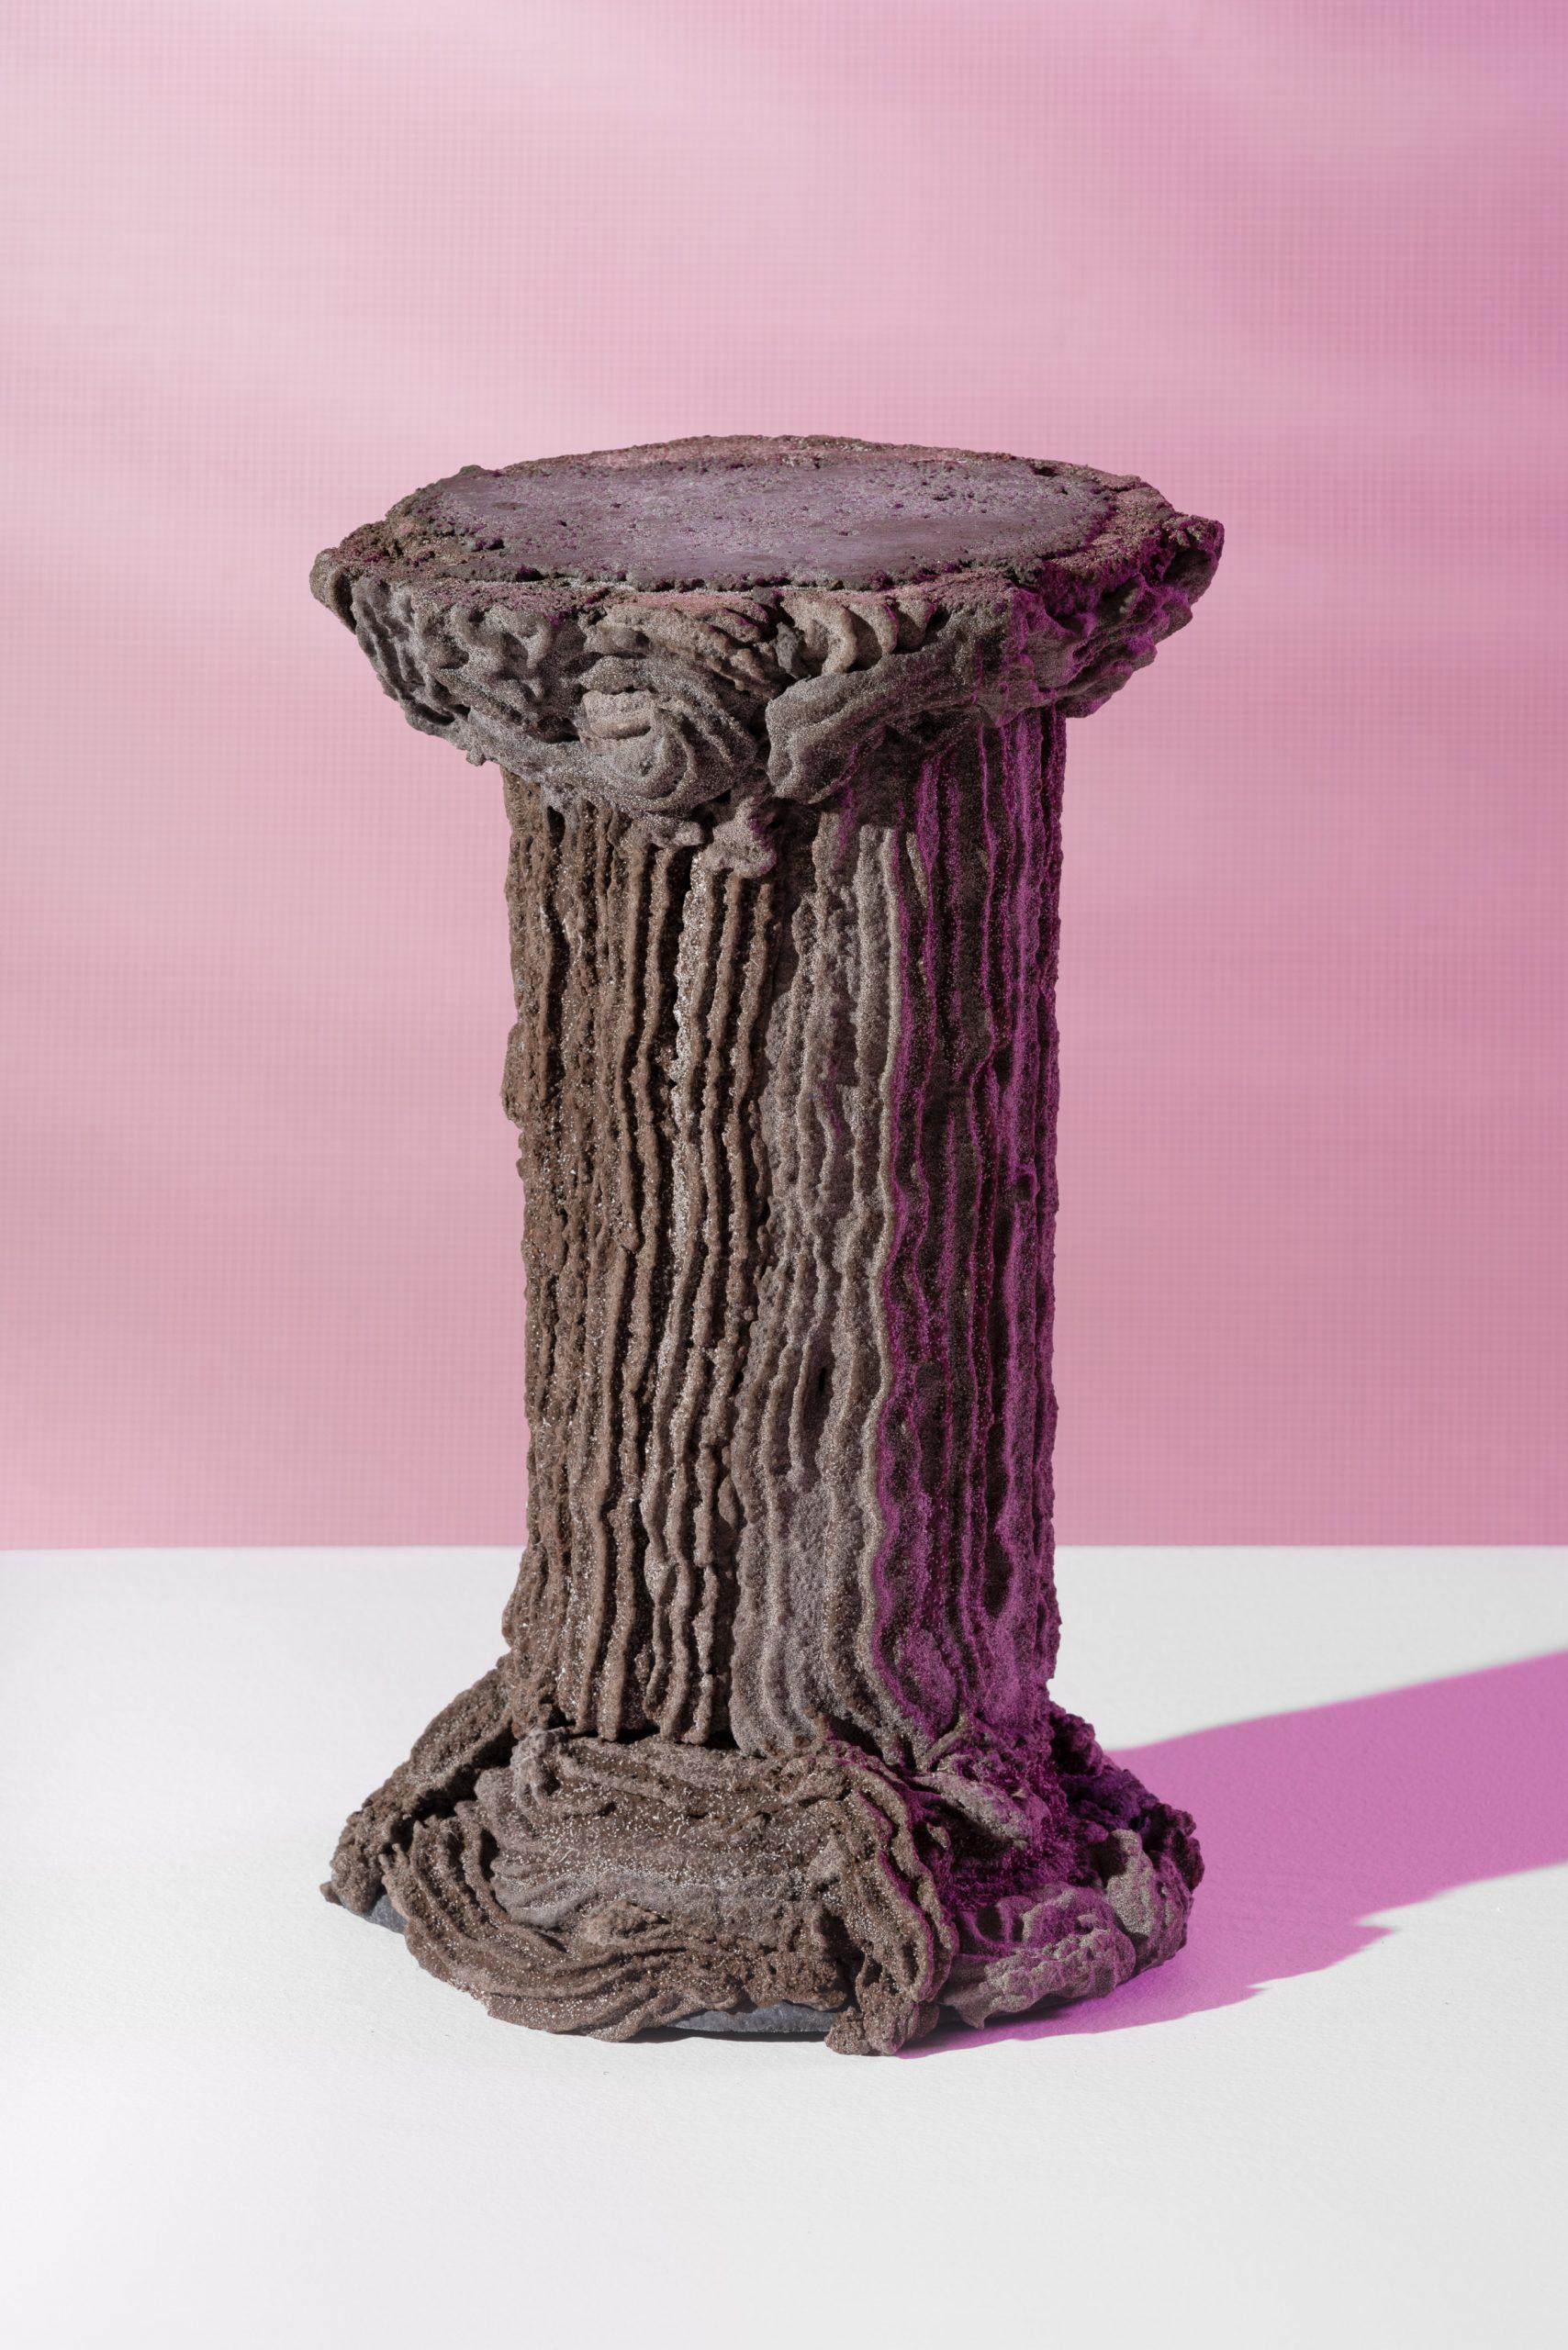 Pedestal by Kajsa Willner for Metabolic Processes for Leftovers exhibition